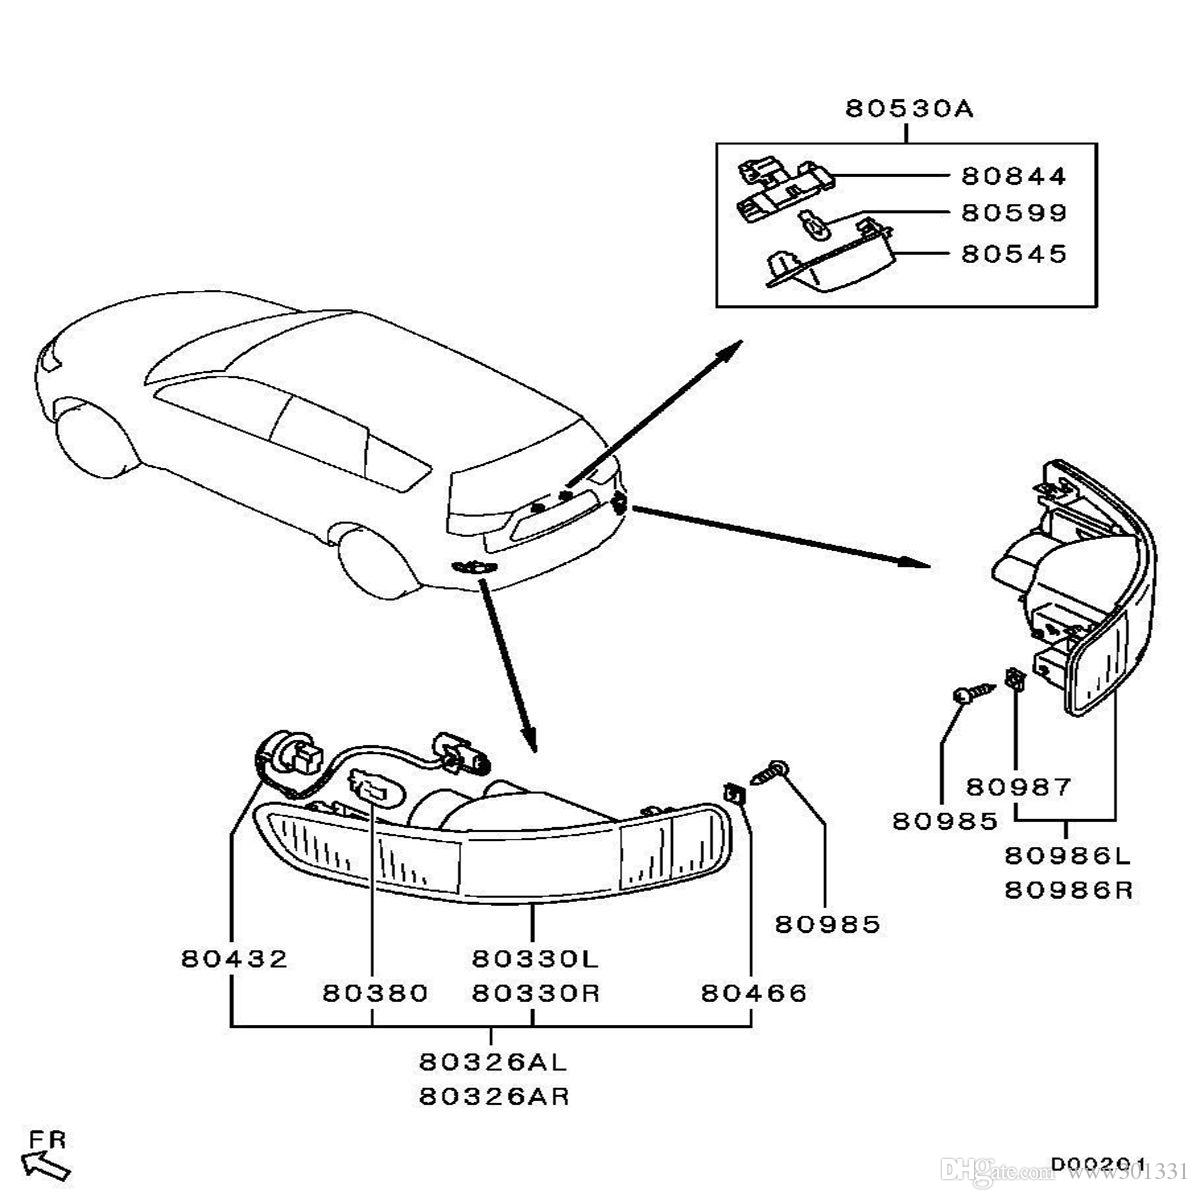 Rear bumper right left tail fog light l fit for mitsubishi outlander 2007 2012 peugeot 4007 2007 2012 citroen c crosser from 301331 45 23 dhgate